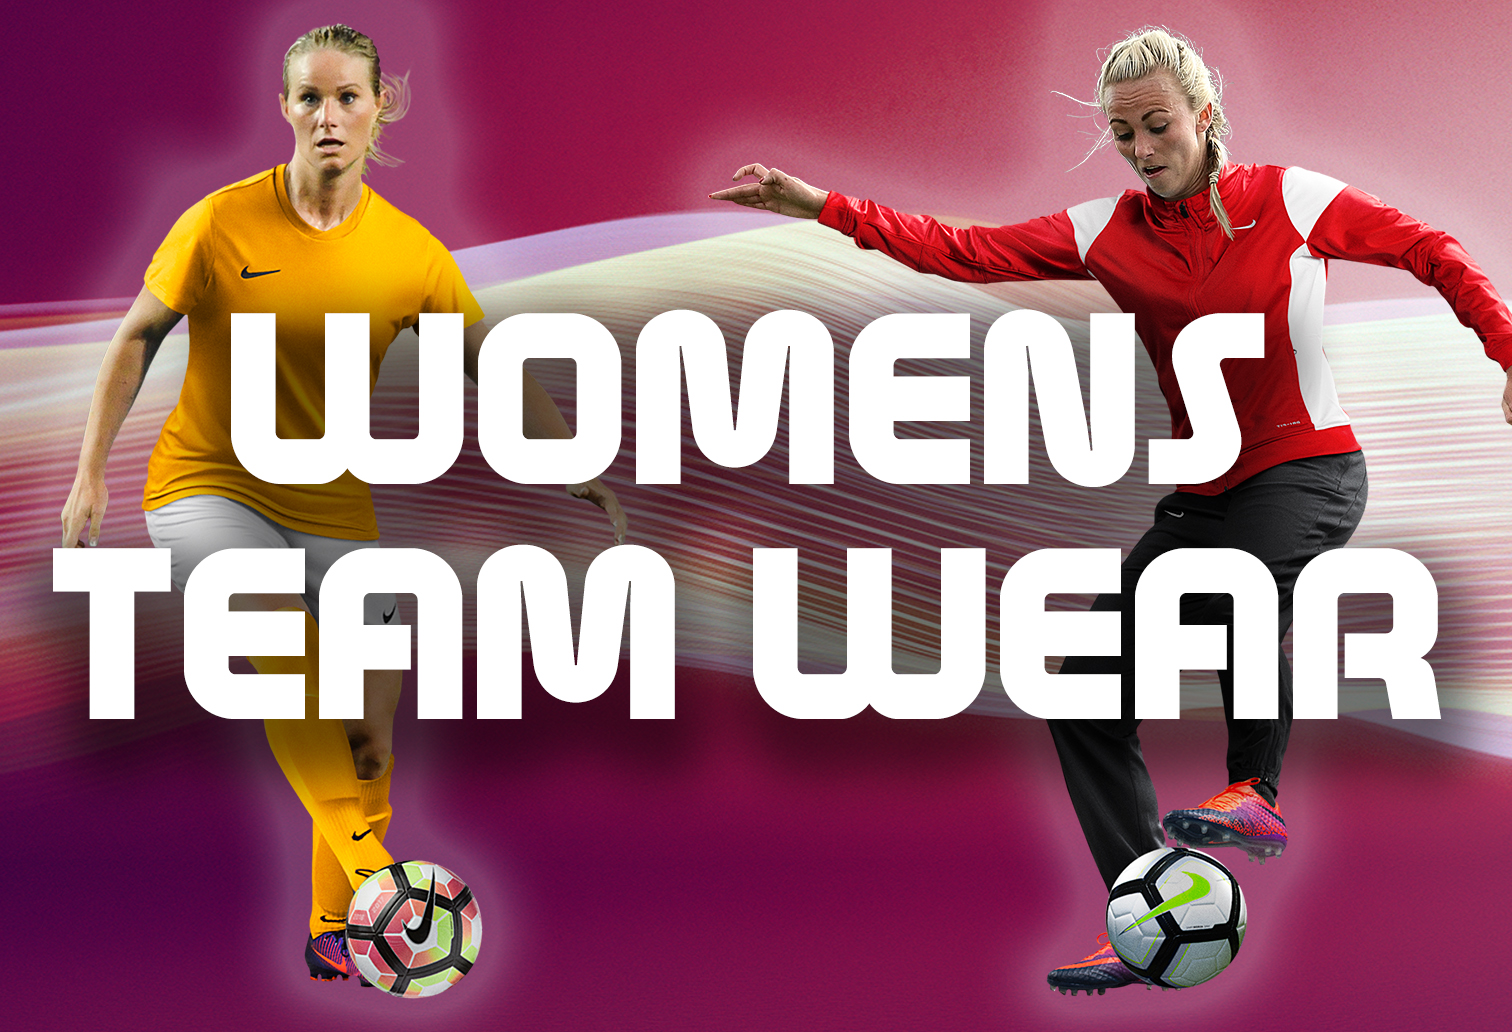 womens-team-wear.jpg